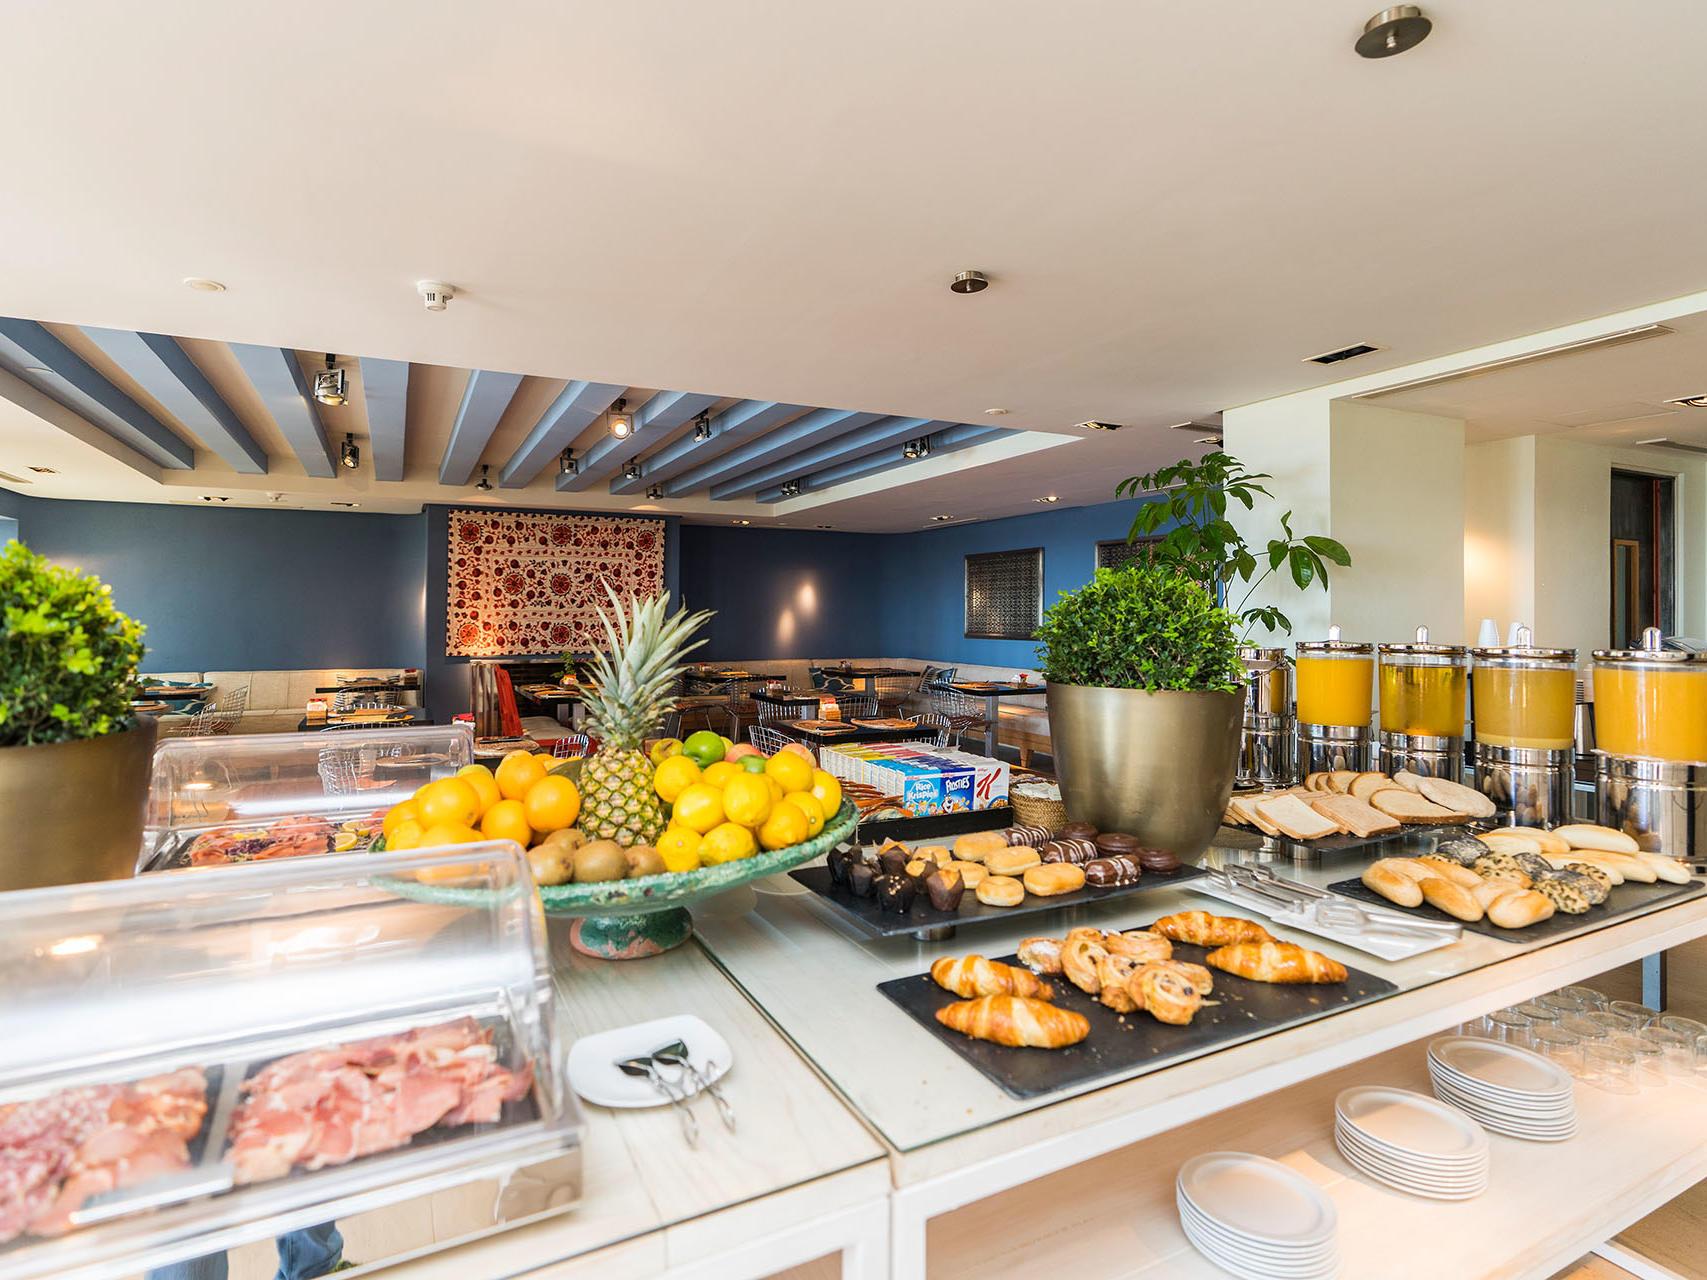 Breakfast Buffet at Hotel Club Maritimo de Sotogrande, Cádiz, Spain